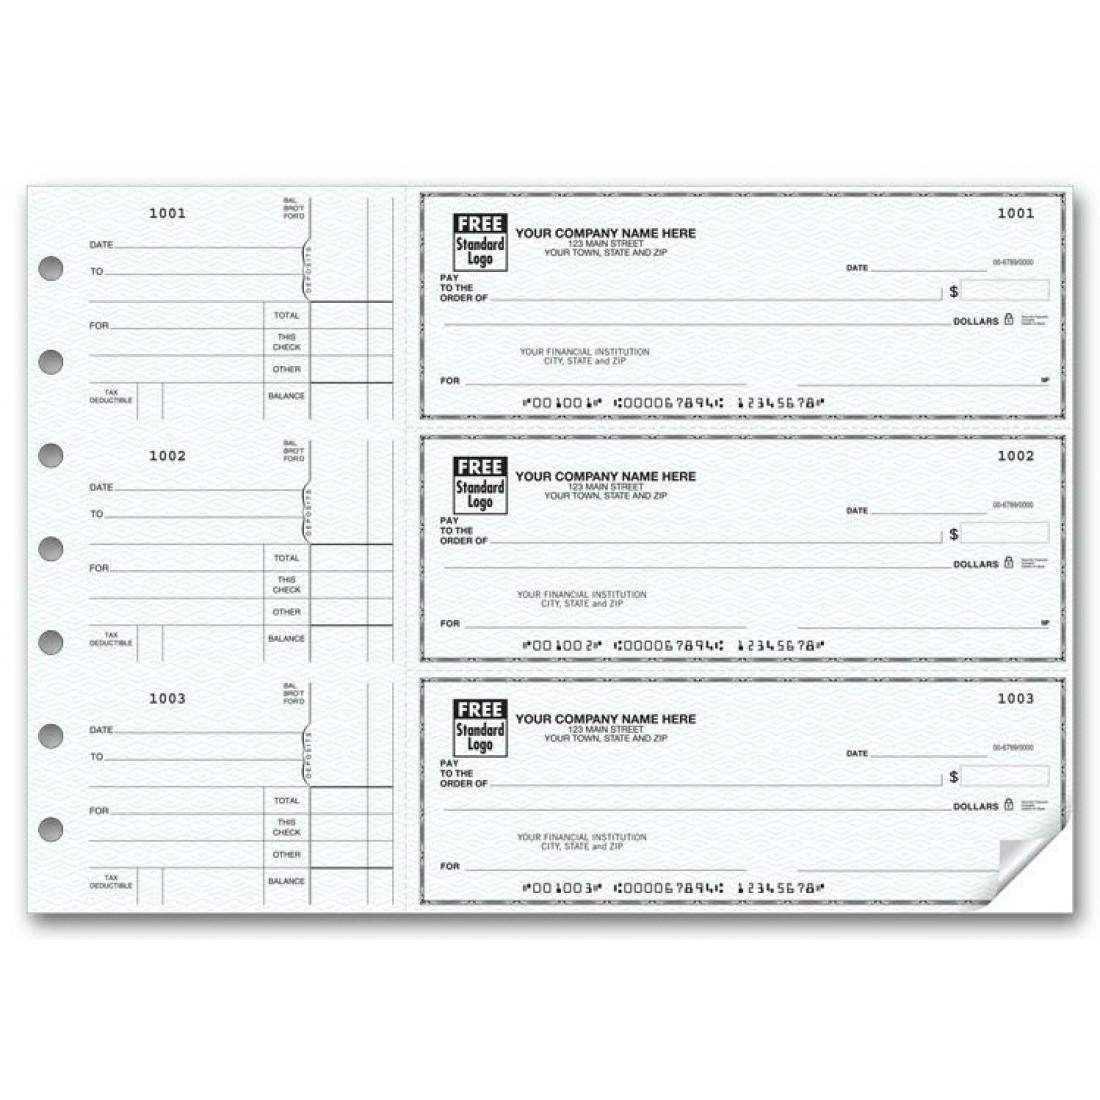 General Manual Business Checks - Business Checks Order